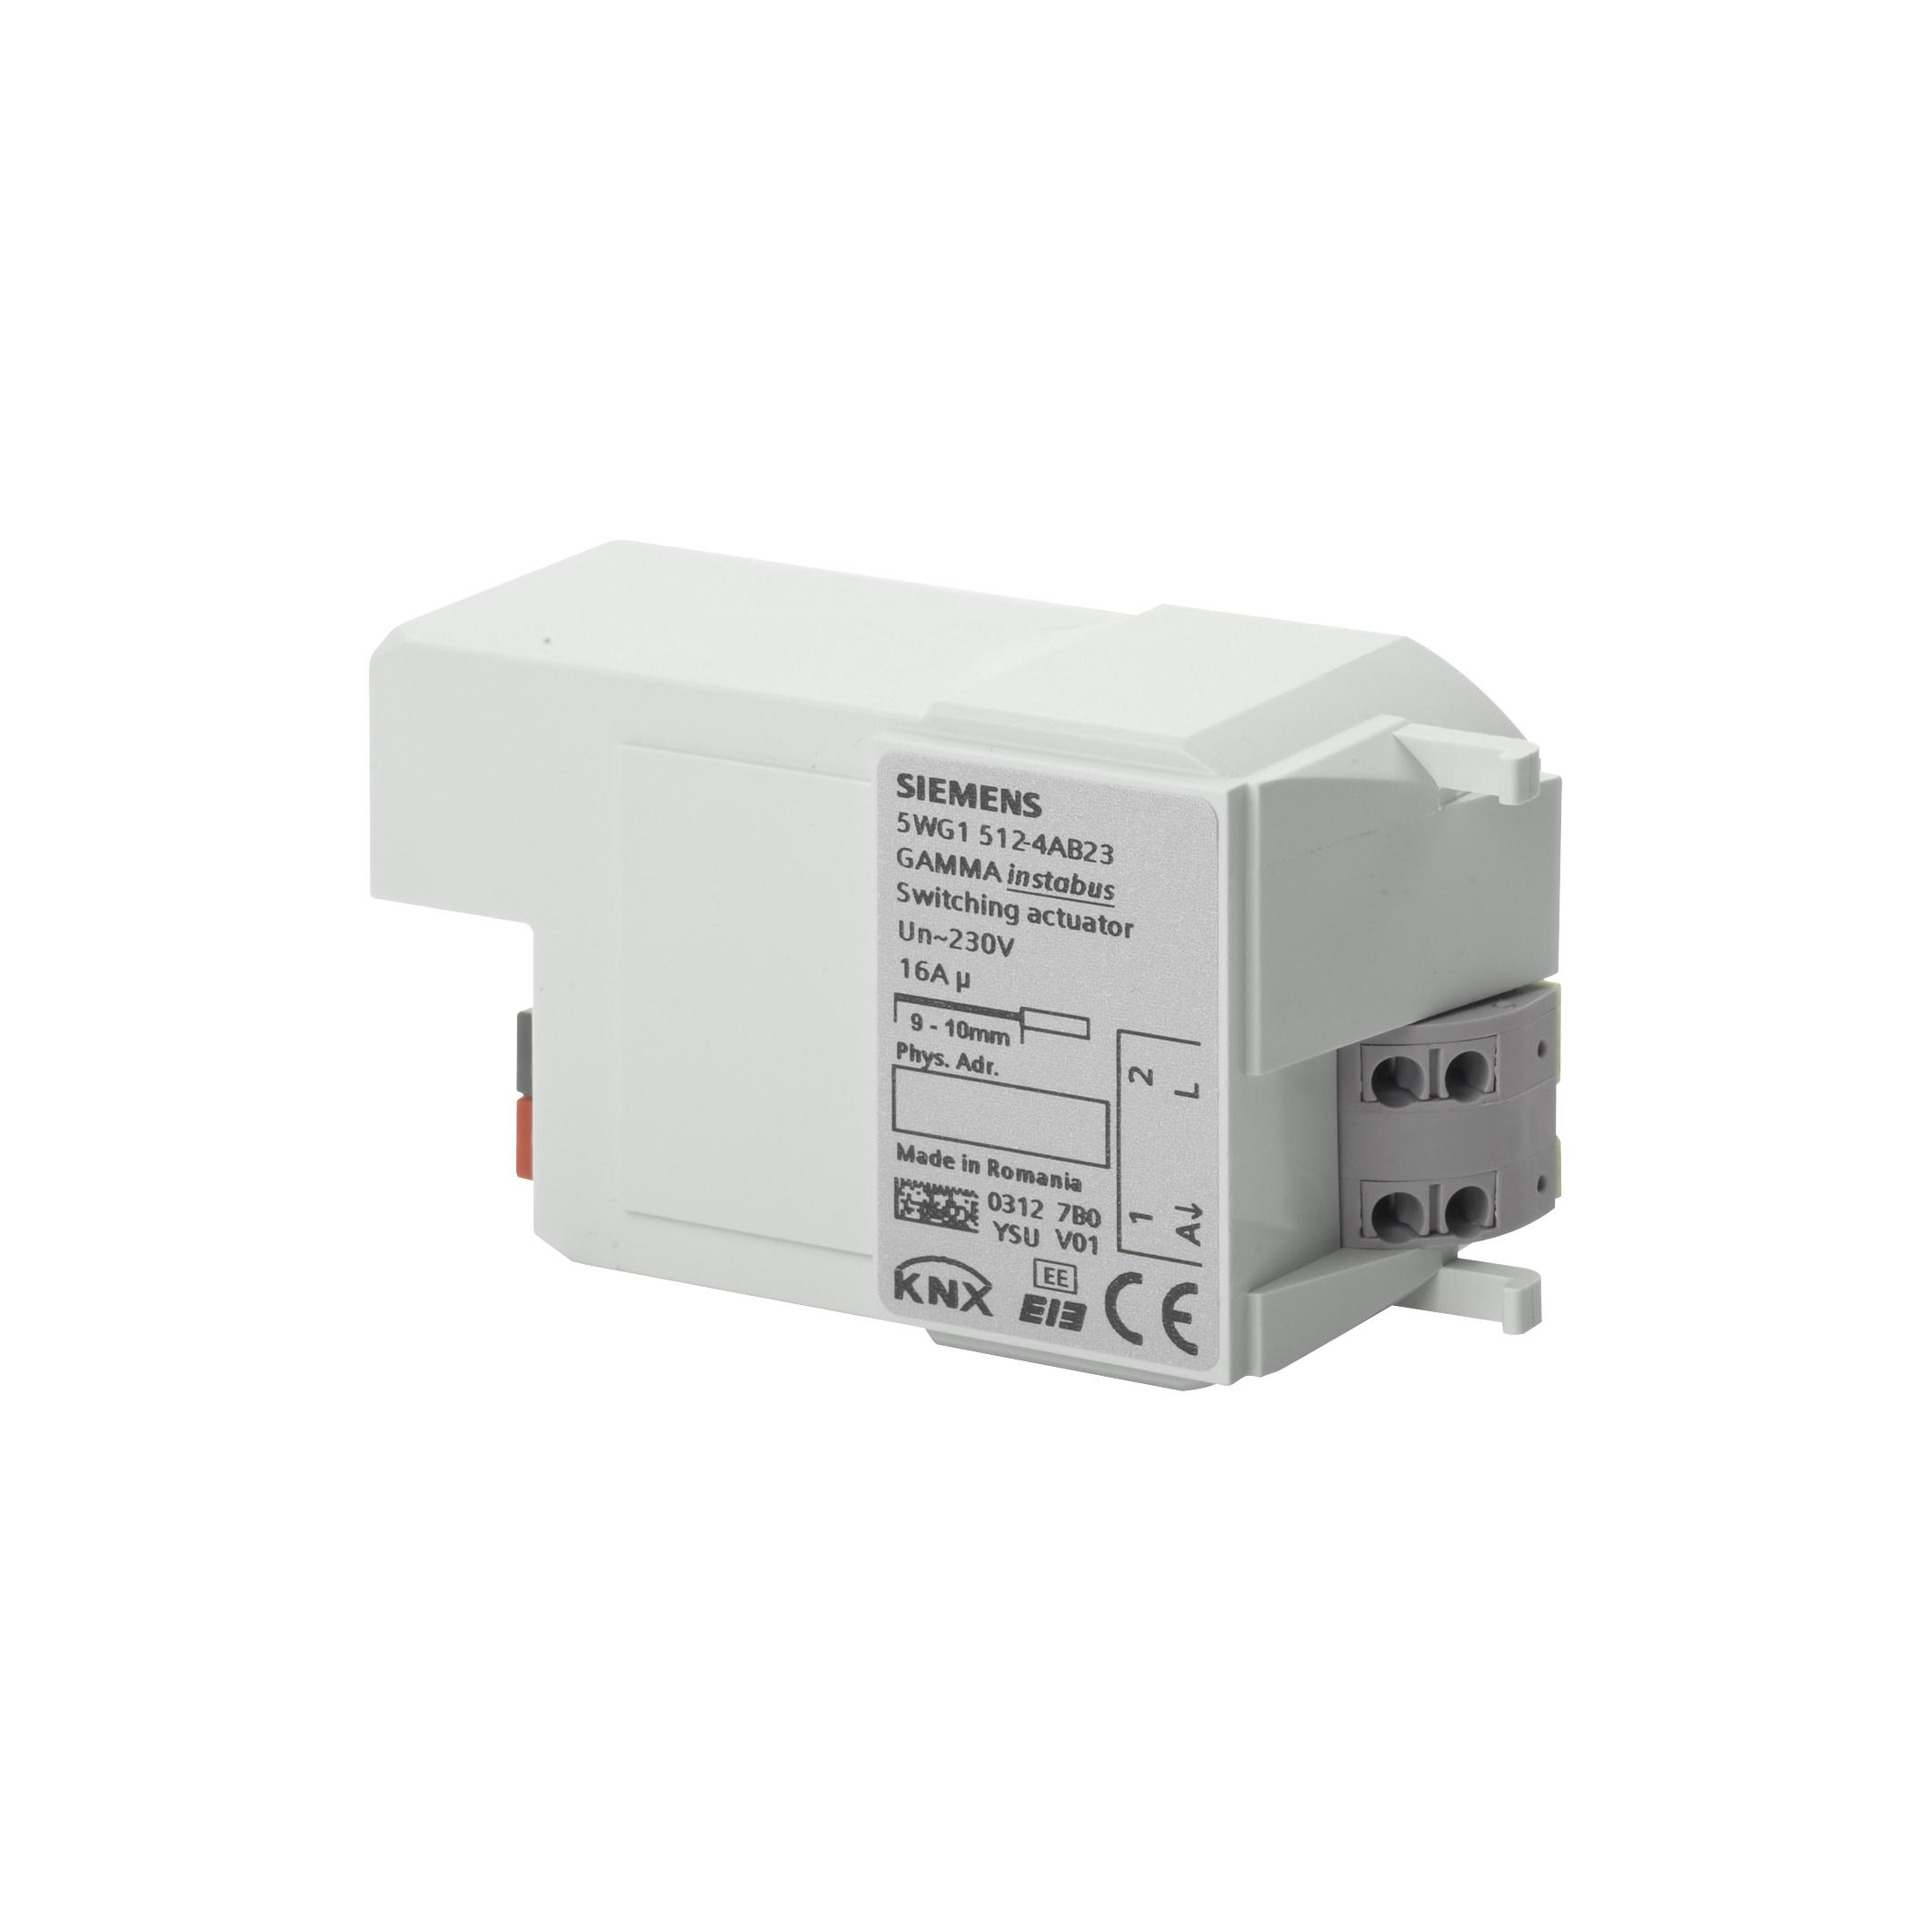 1 Stk Schaltaktor, 1 x AC 230 V, C-Last KX5124AB23